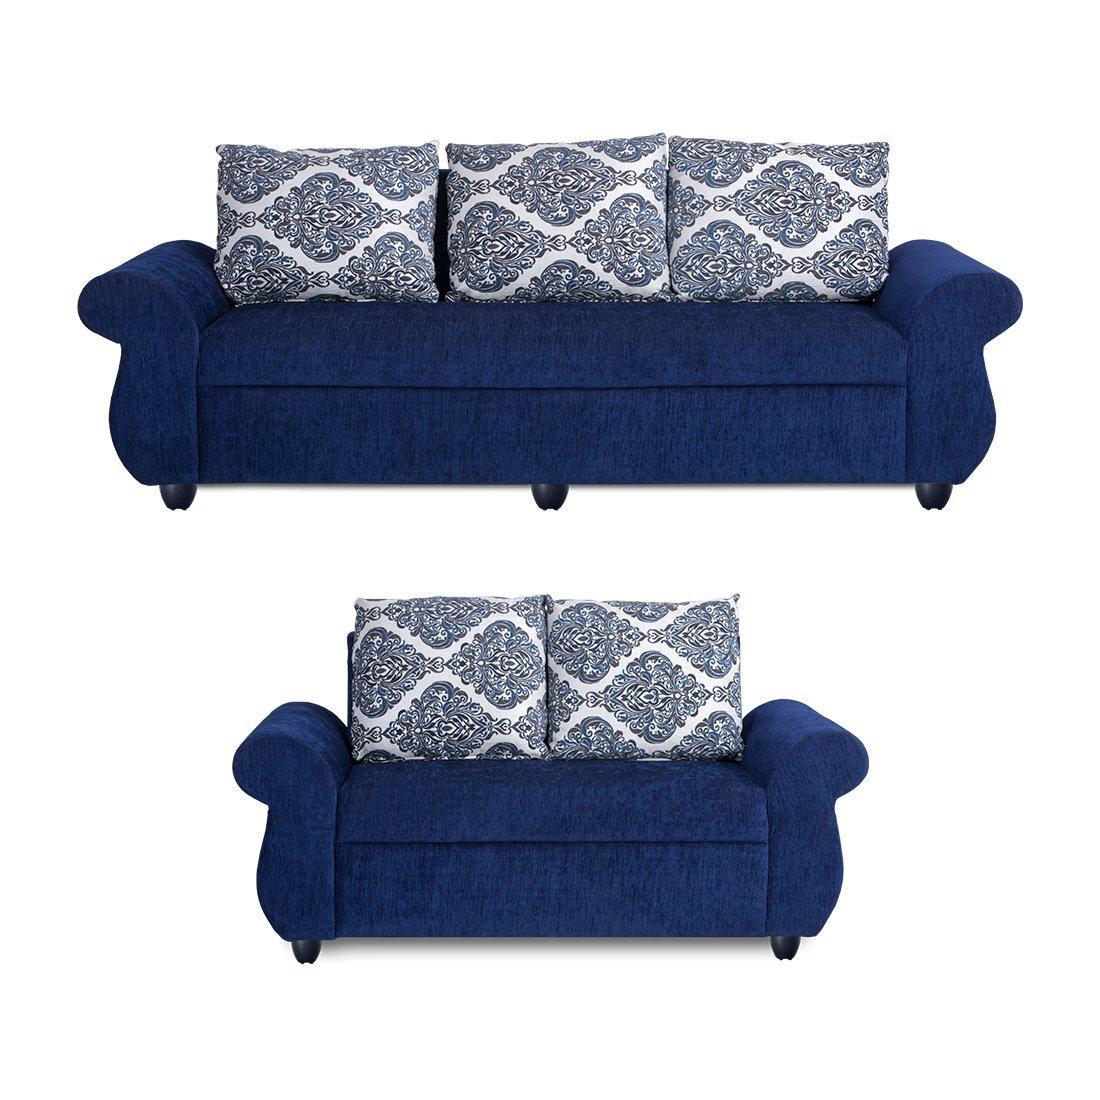 Picture of: Bharat Lifestyle Alisa Fabric 3 2 Blue Sofa Set Online Price In India Buybharat Lifestyle Alisa F